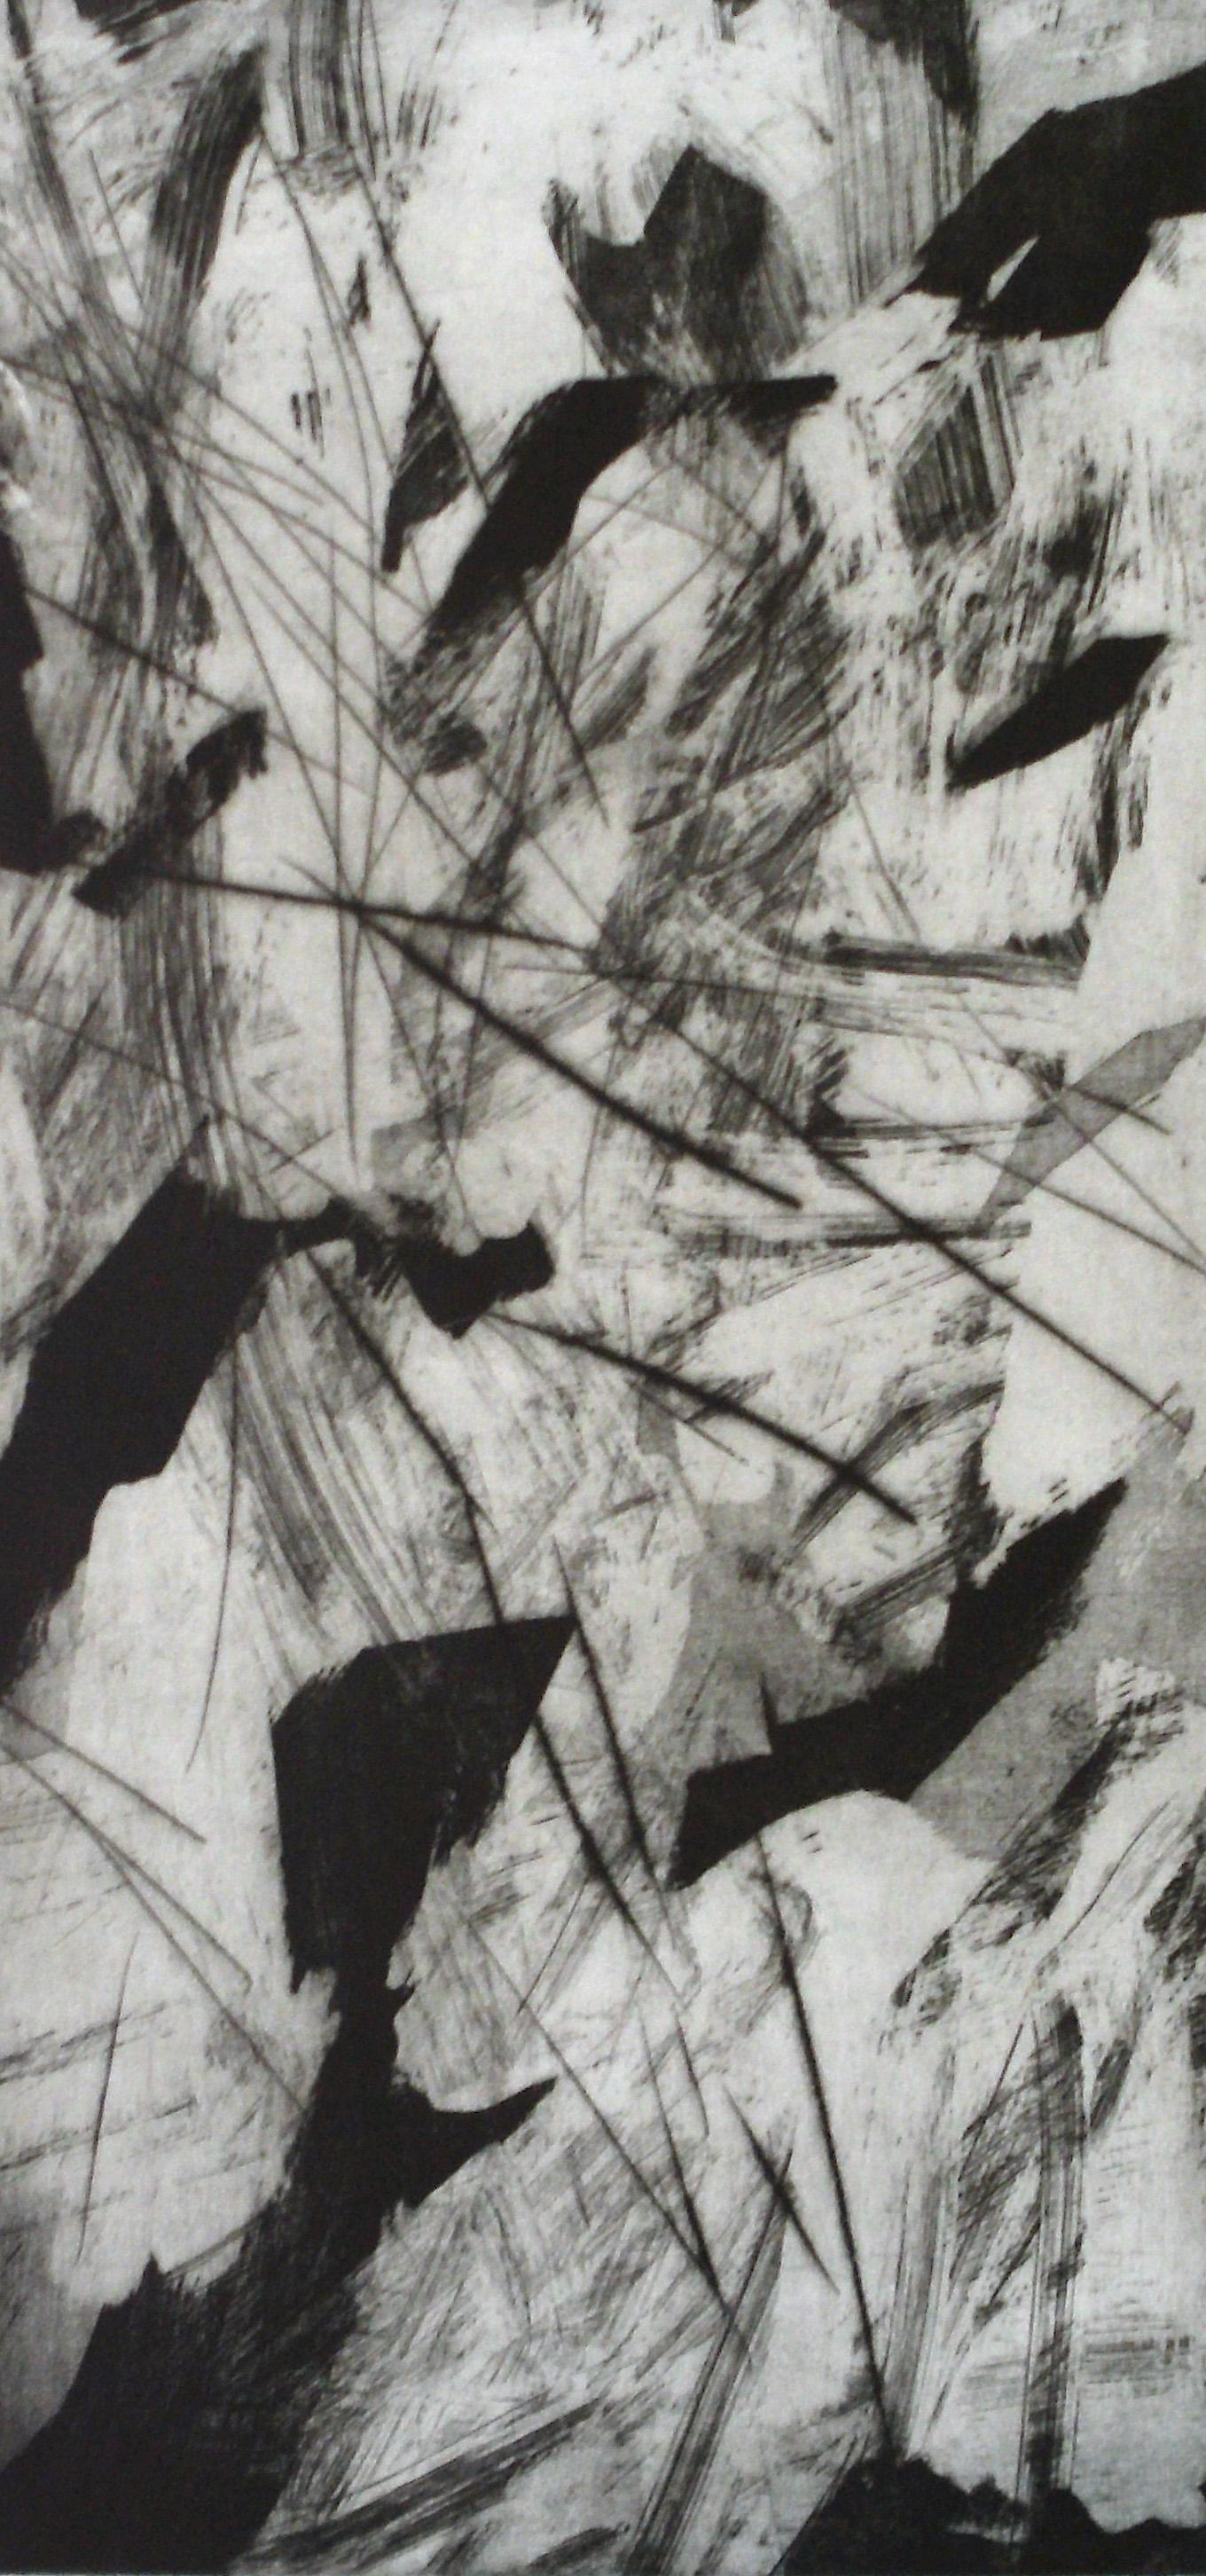 10-kerstin_franke-gneuss-kaltes_licht-2012-aquatinta_kaltnadelradierung-70.6x34.2